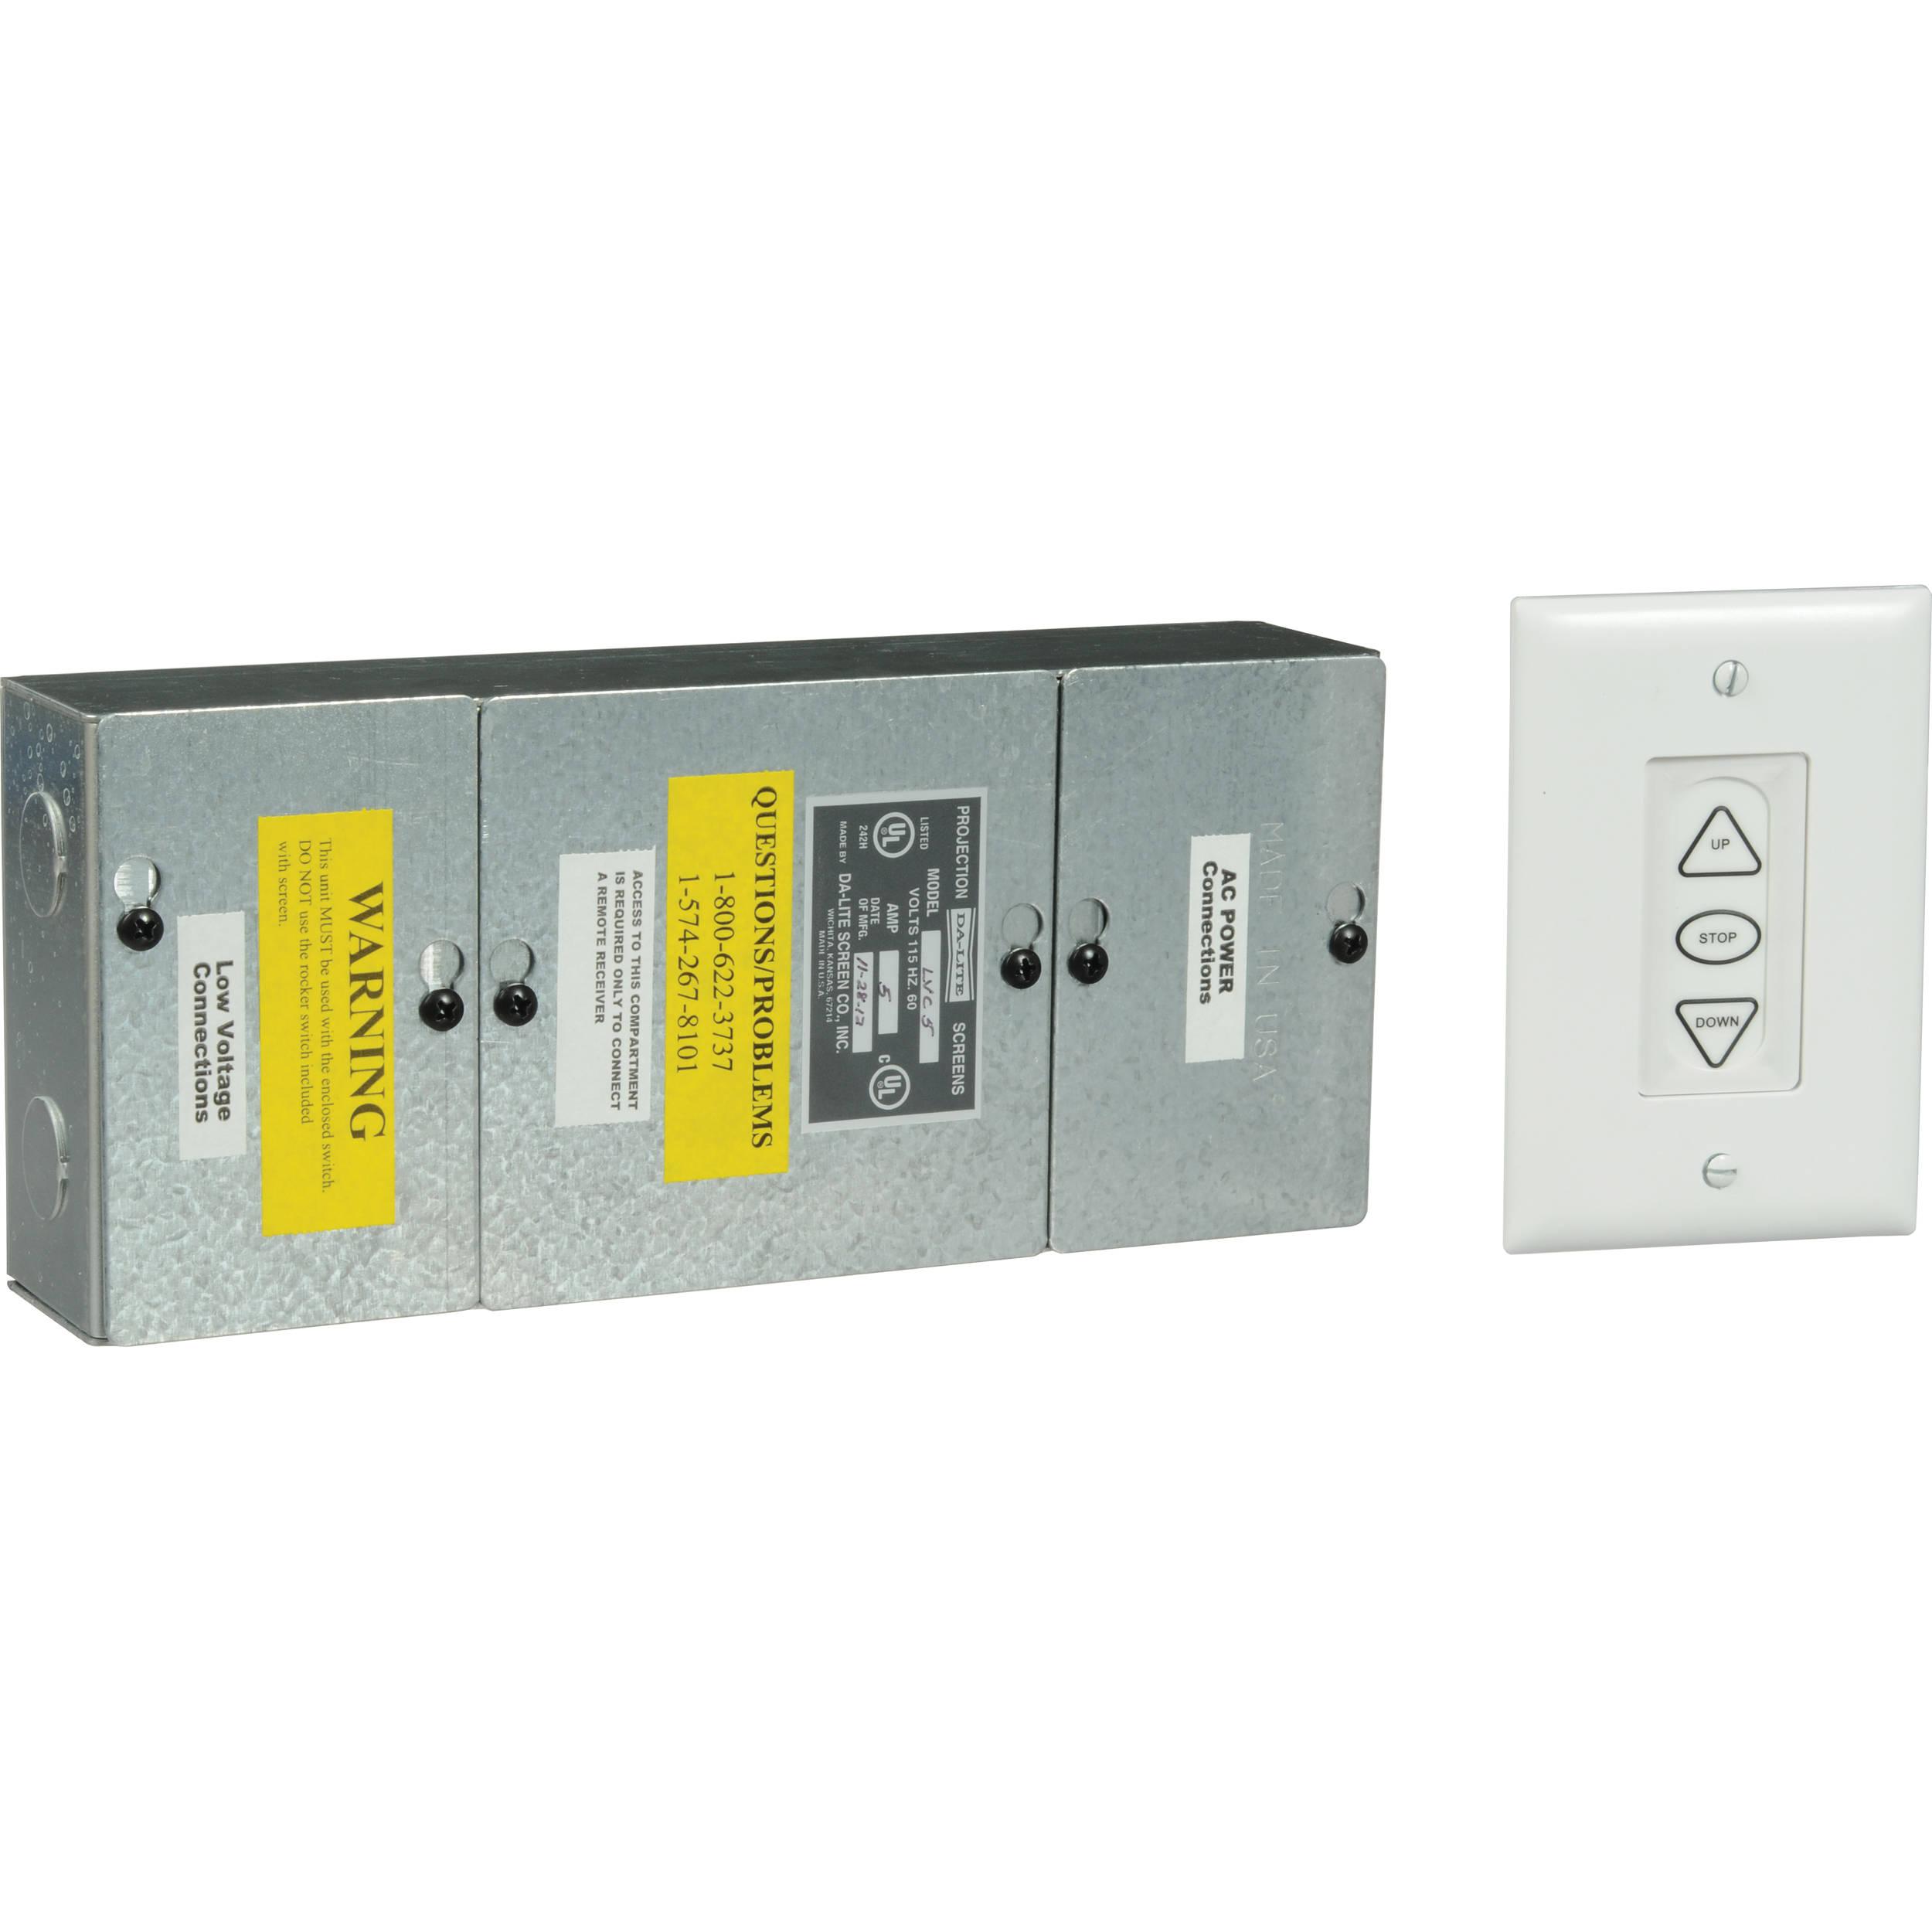 Da-Lite Single Motor Low Voltage Control System on